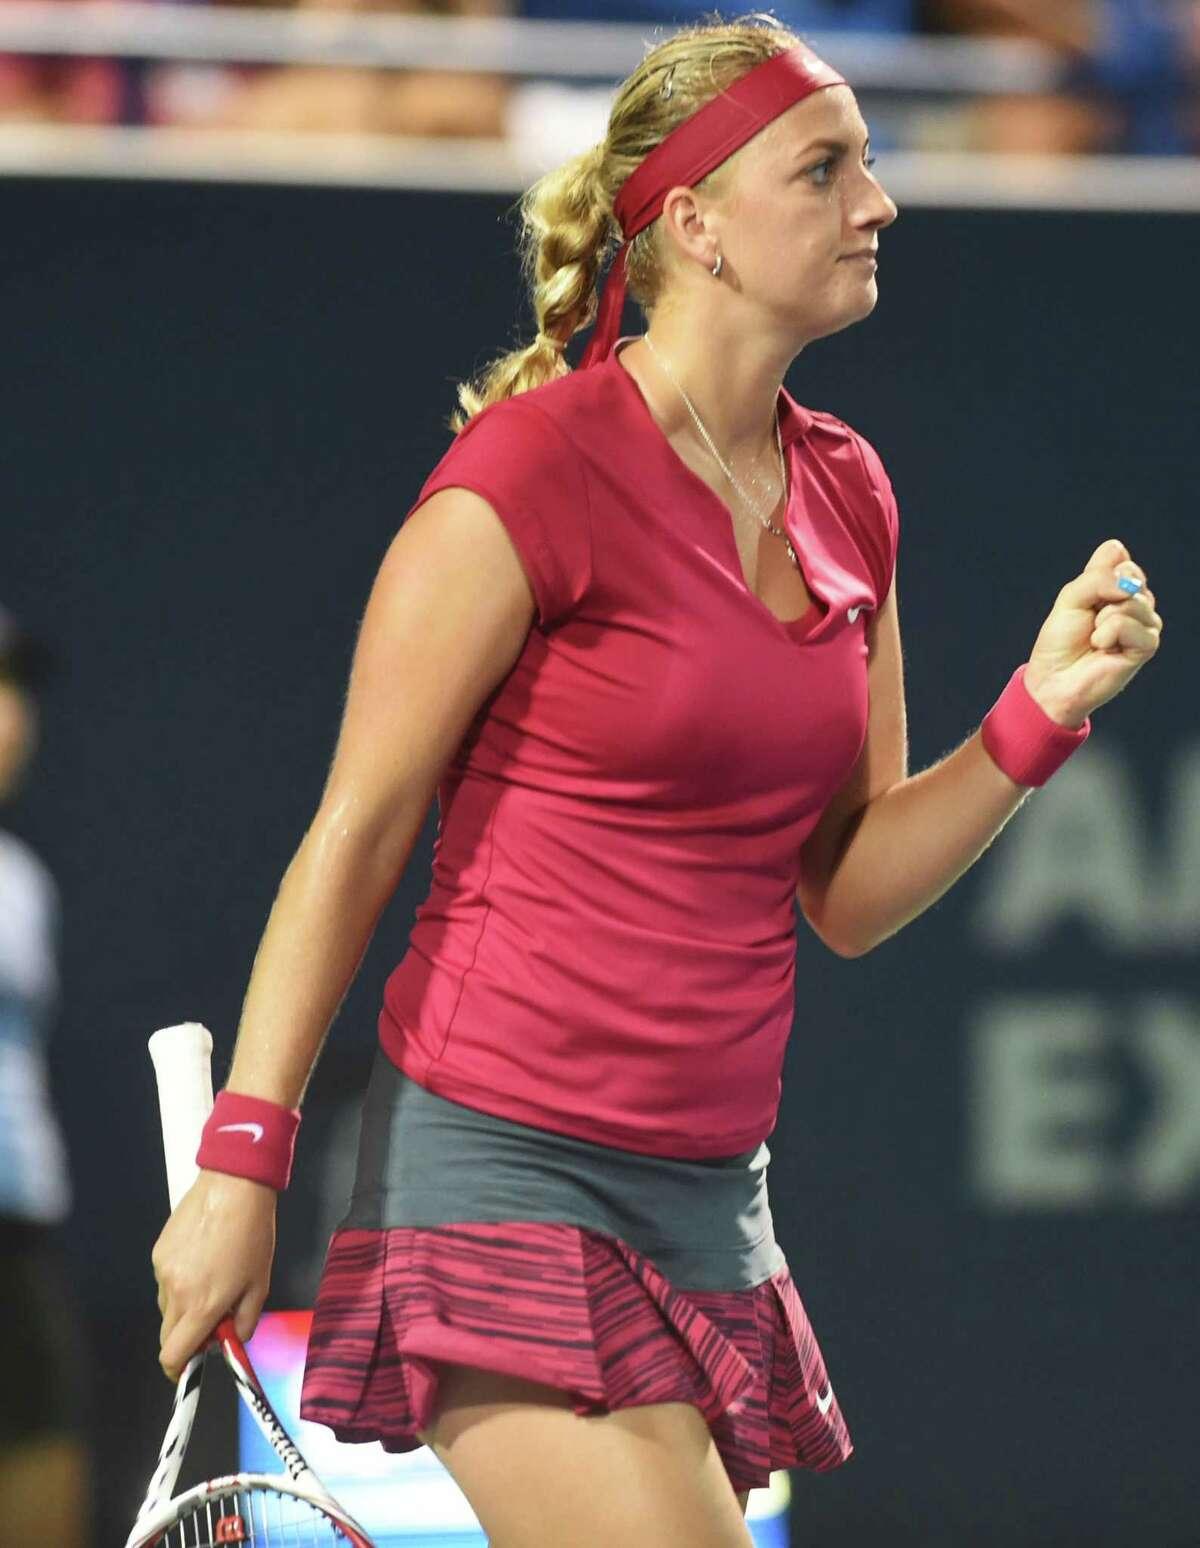 (Melanie Stengel - Register) Connecticut Open Tennis -Petra Kvitova reacts to winning her match 8/19.